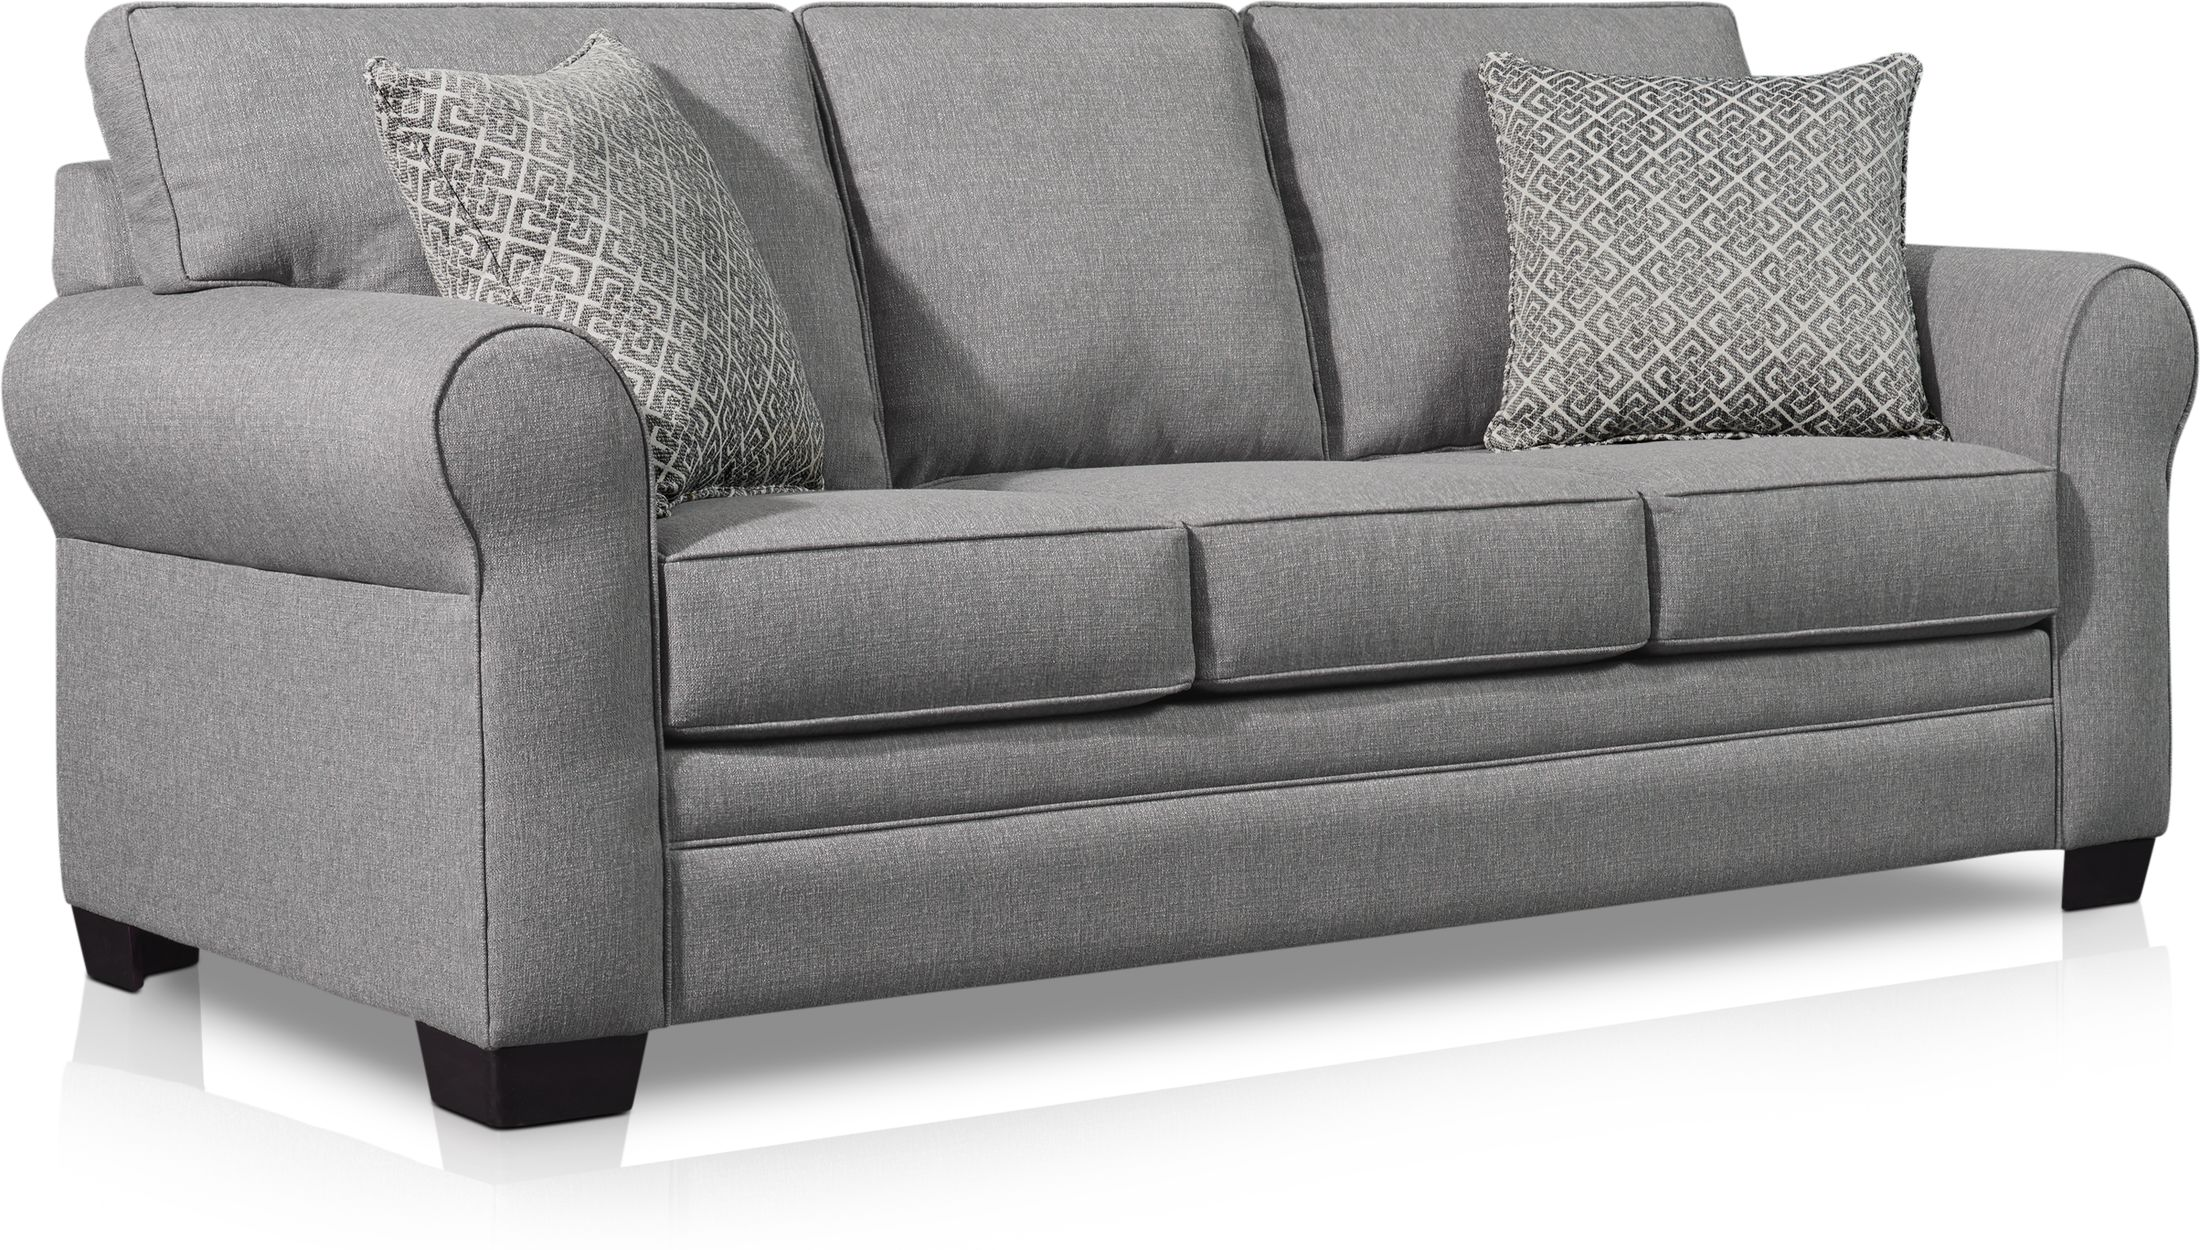 Living Room Furniture - Camila Sofa